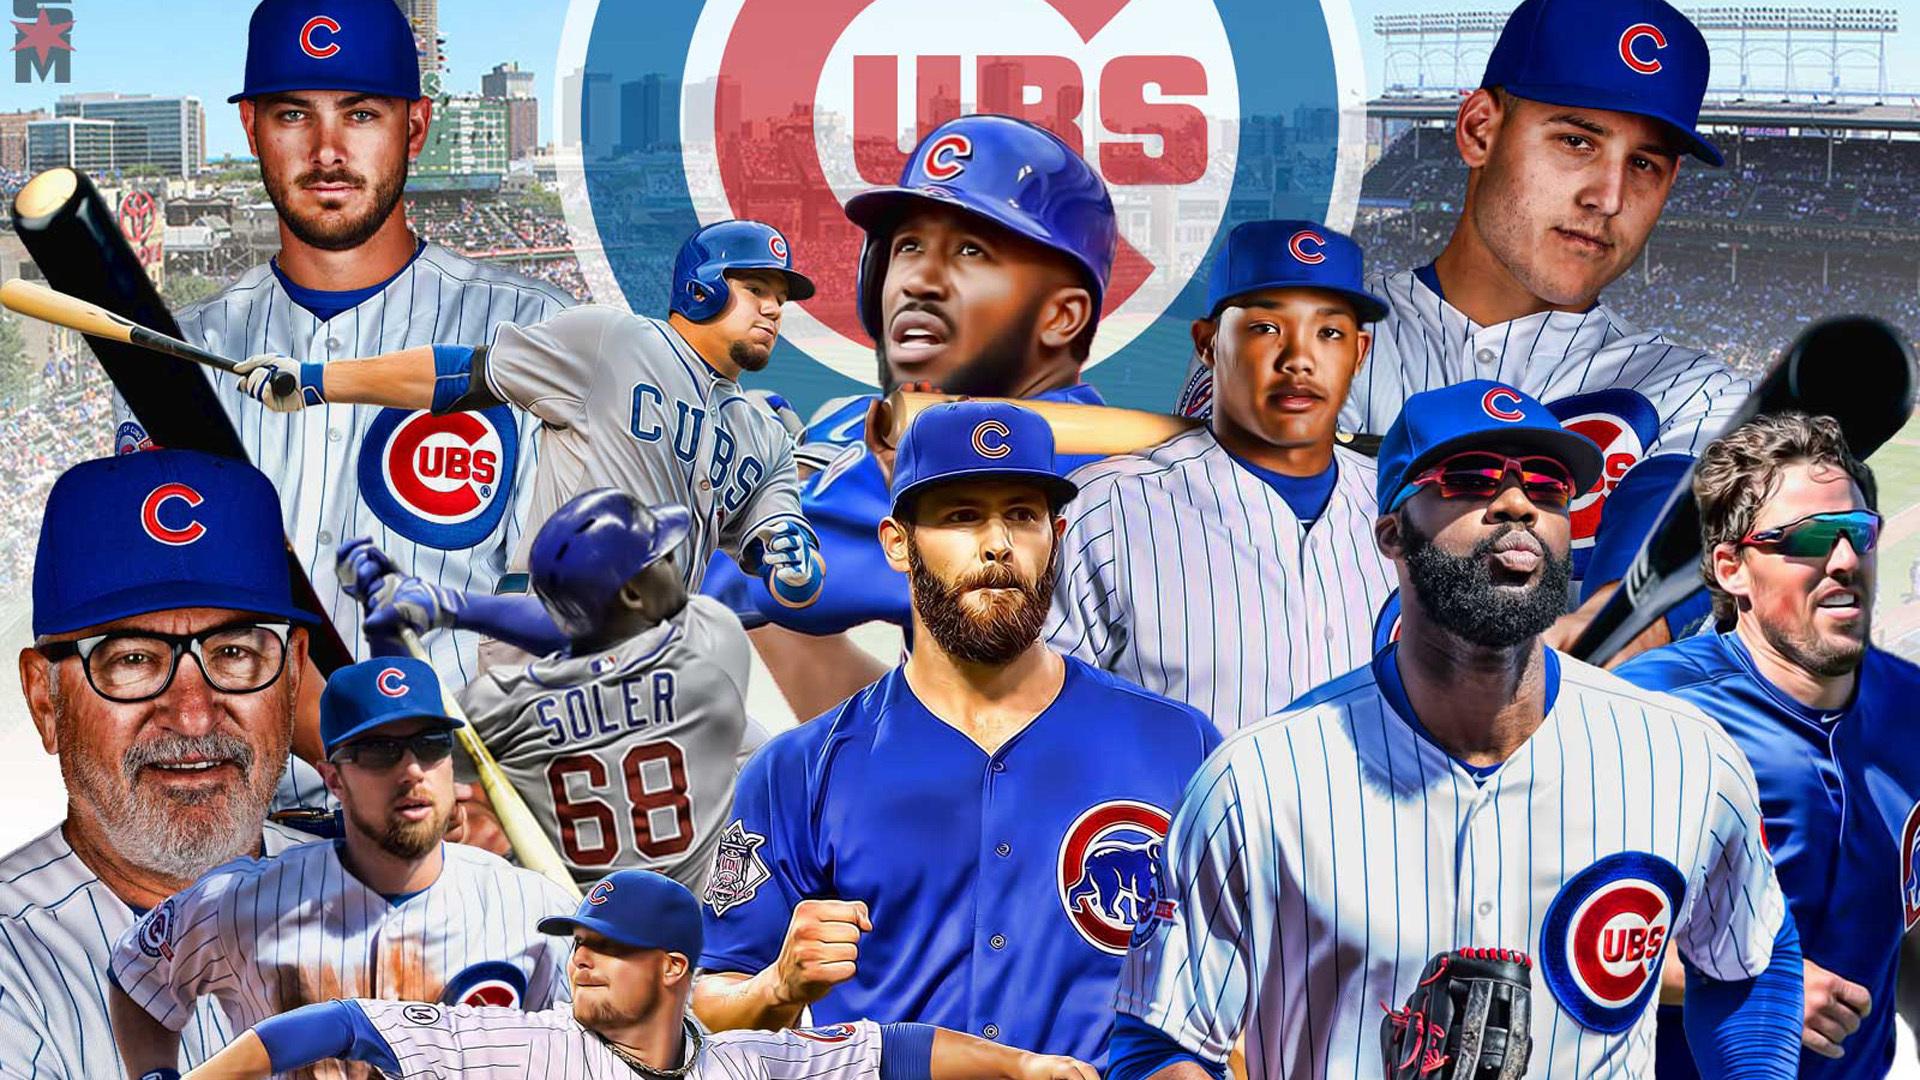 Cubs Wallpapers 62 Wallpapers HD Wallpapers 1920x1080